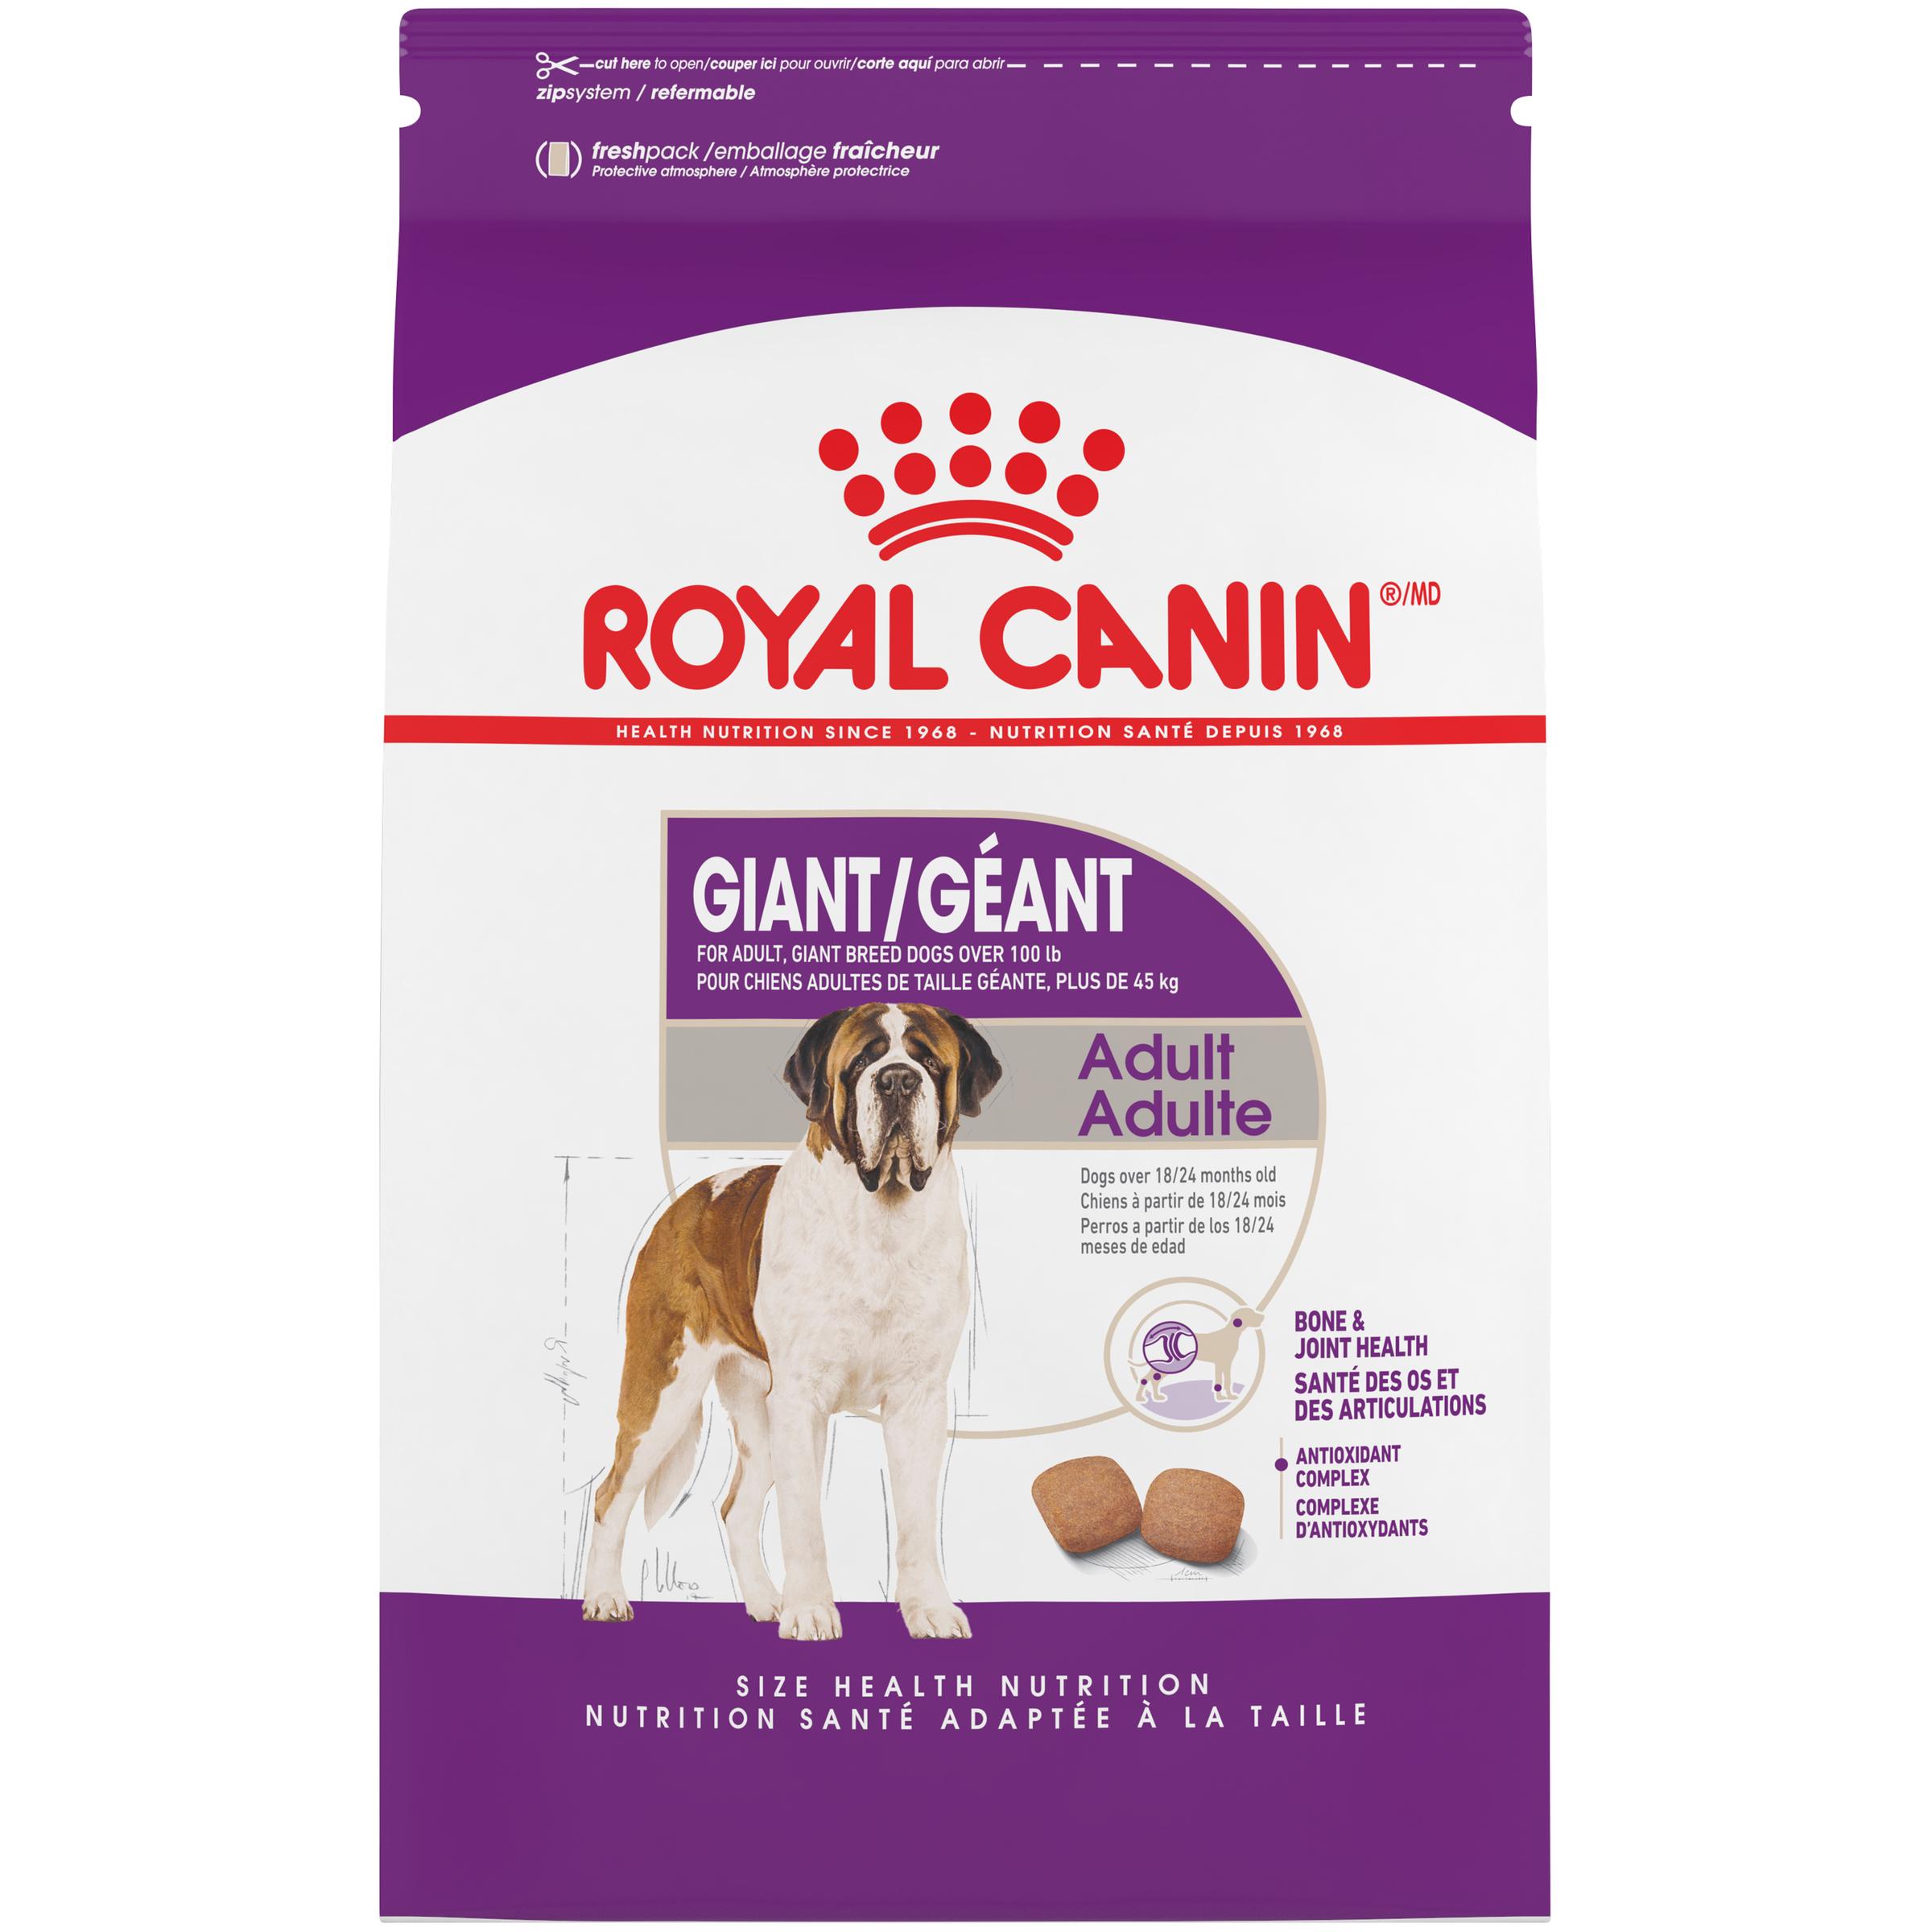 Royal Canin SHN Giant Adult Dry Dog Food Image